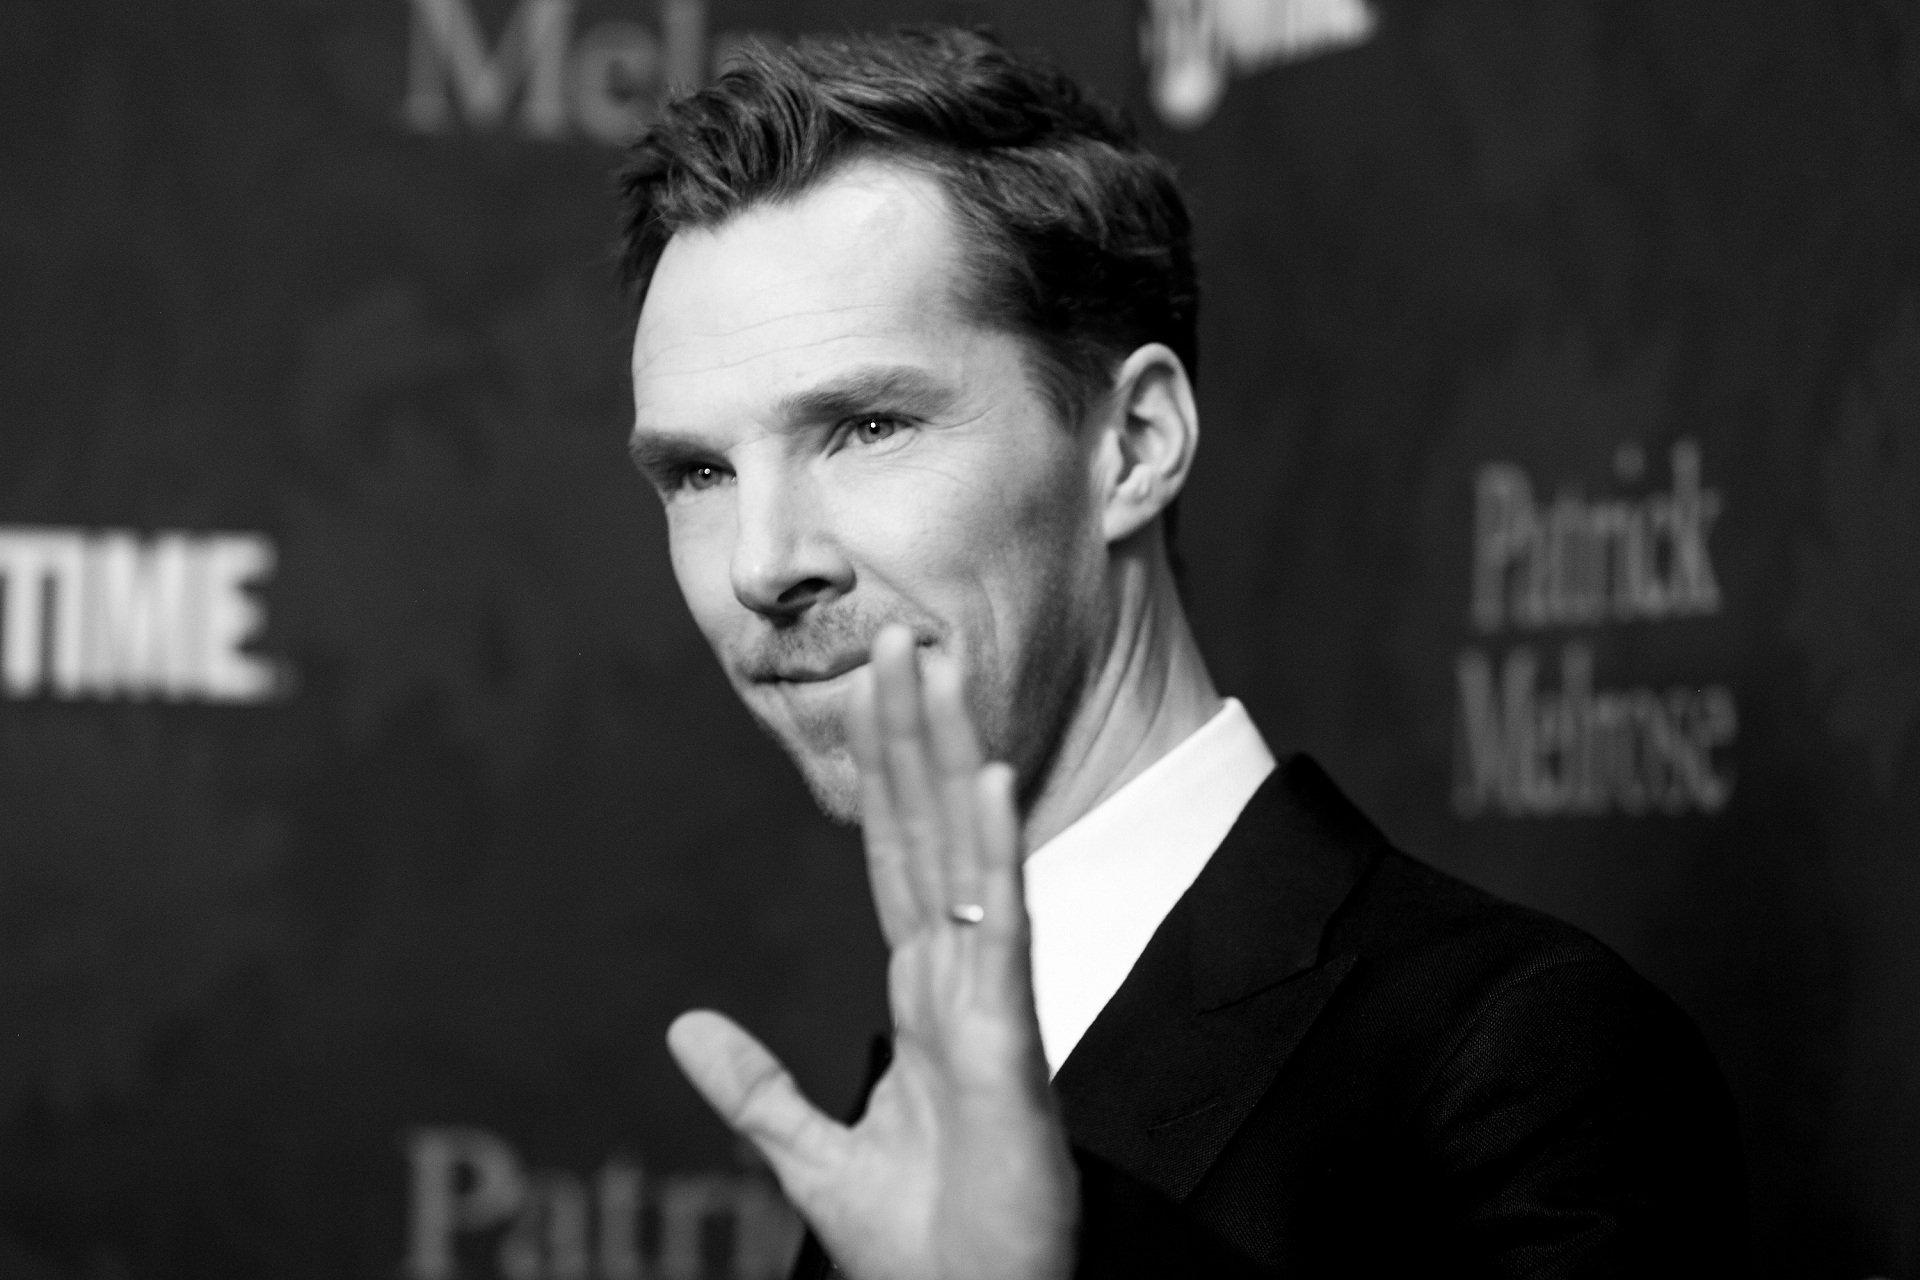 Benedict Cumberbatch Image - ID: 331189 - Image Abyss